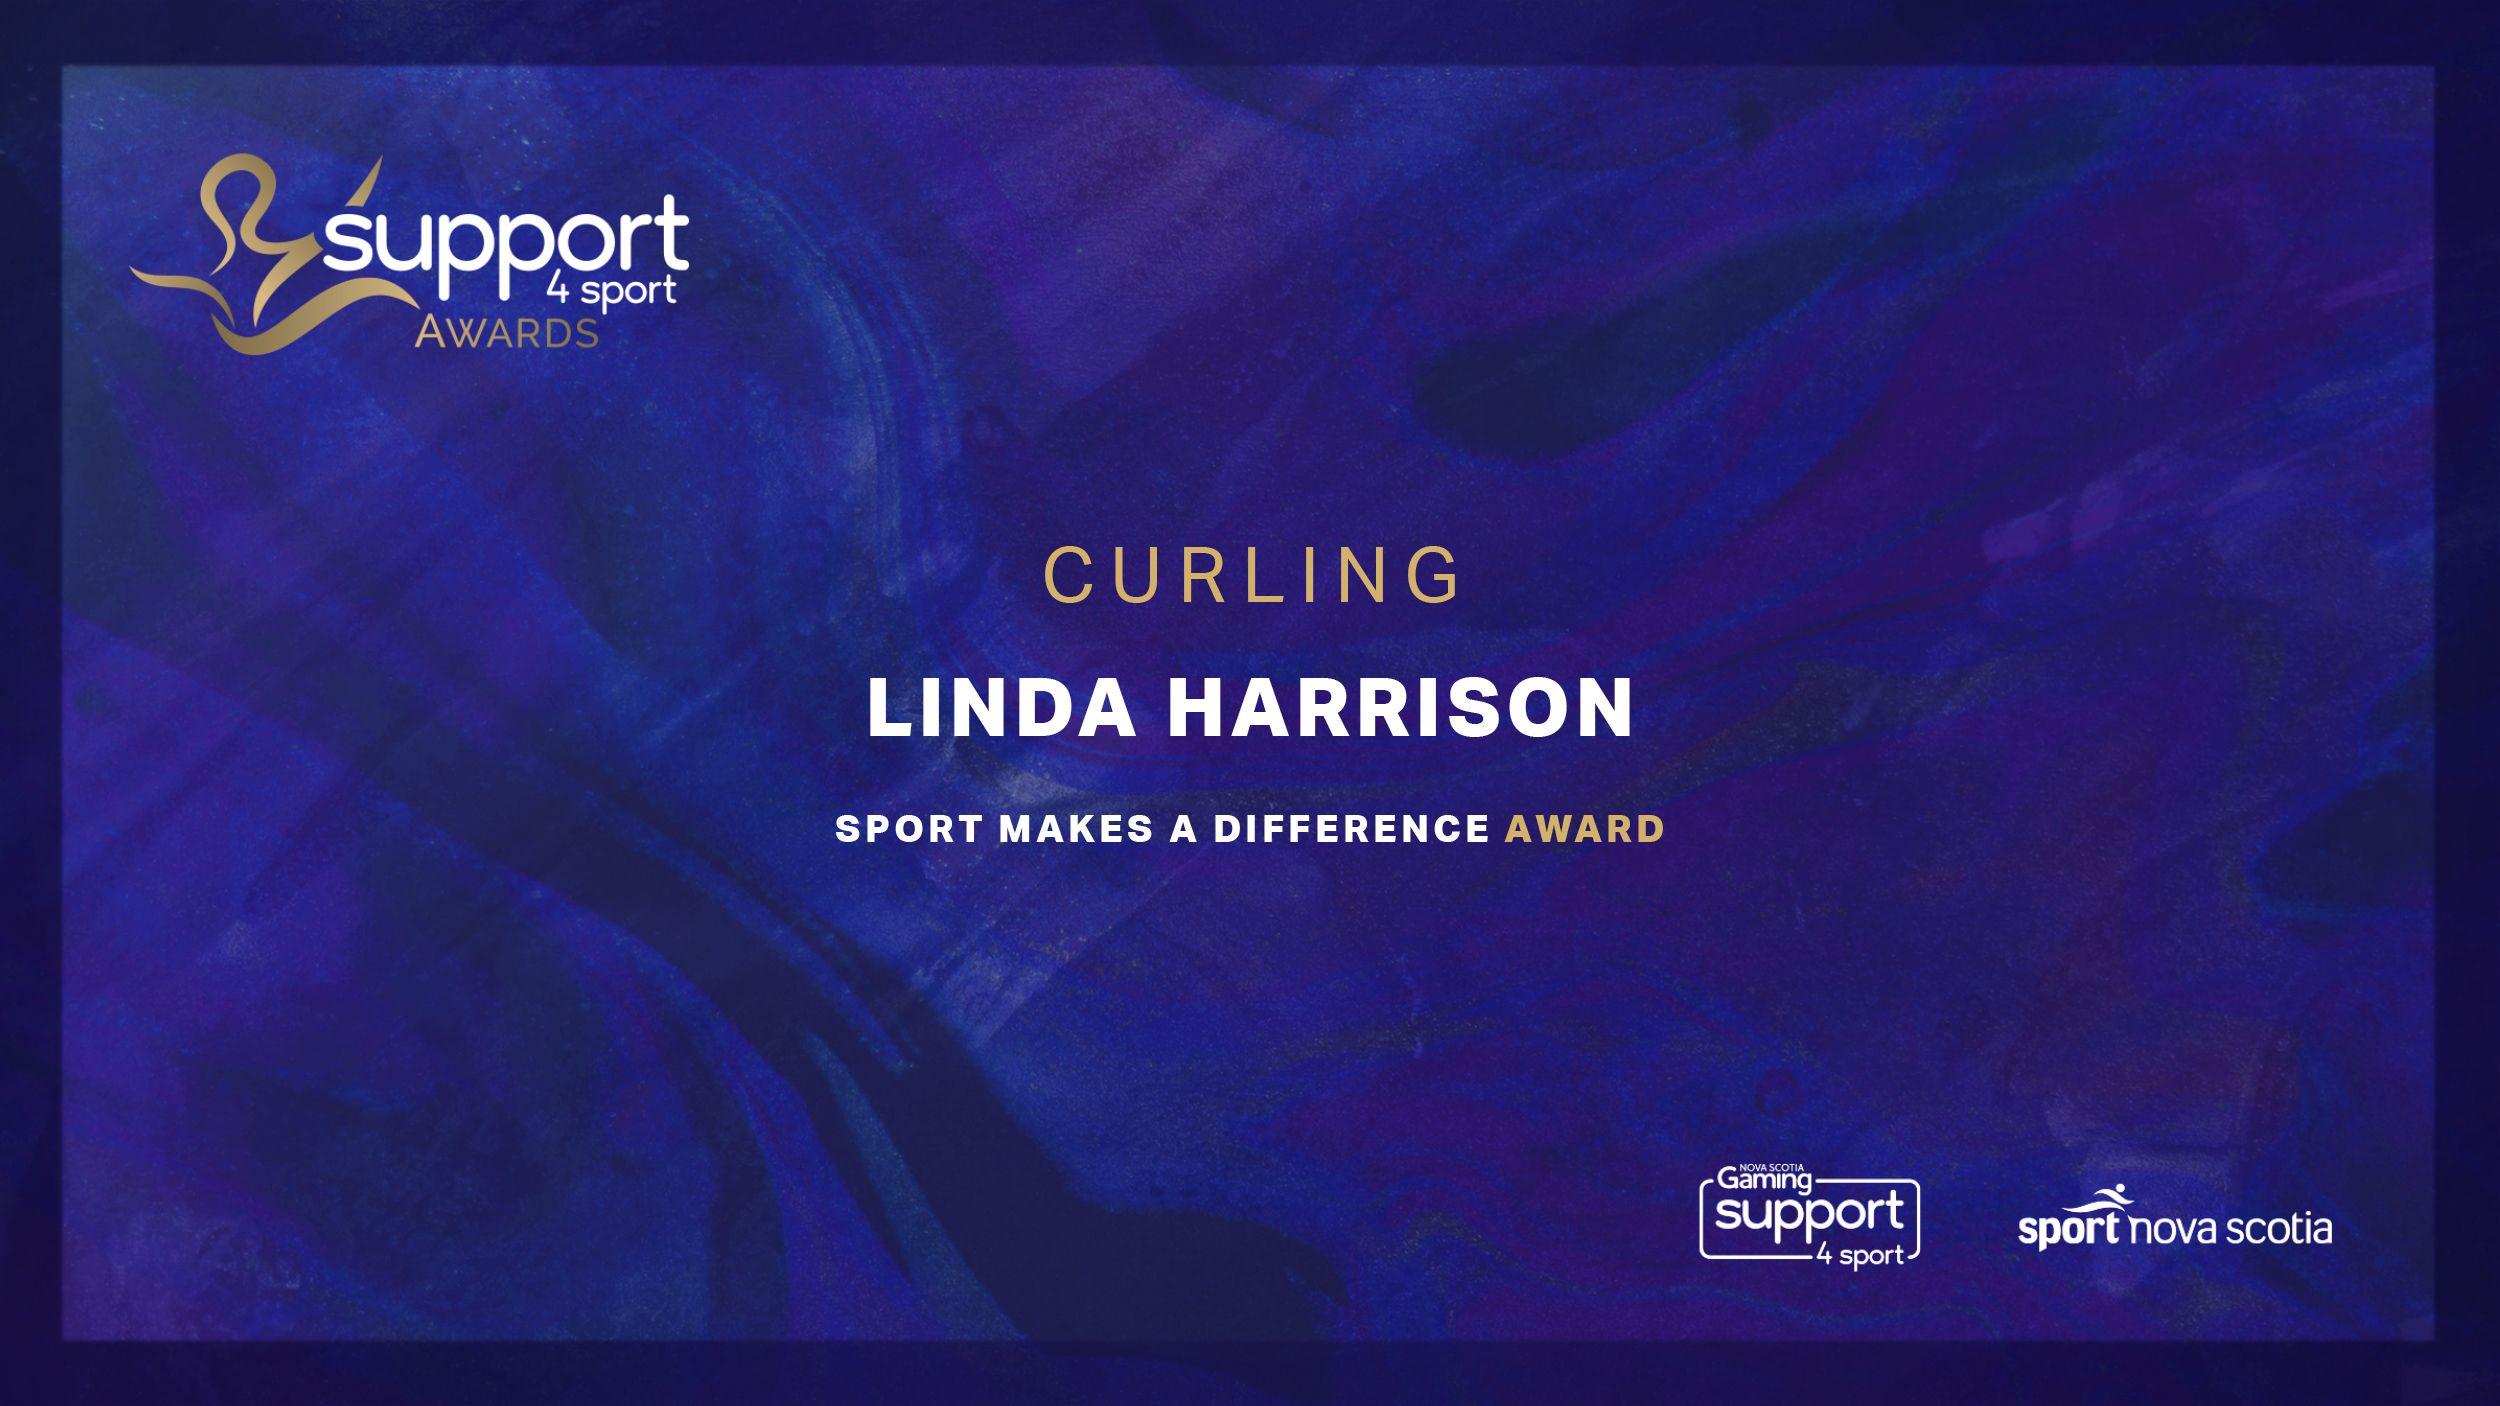 Congratulations, Linda Harrison!